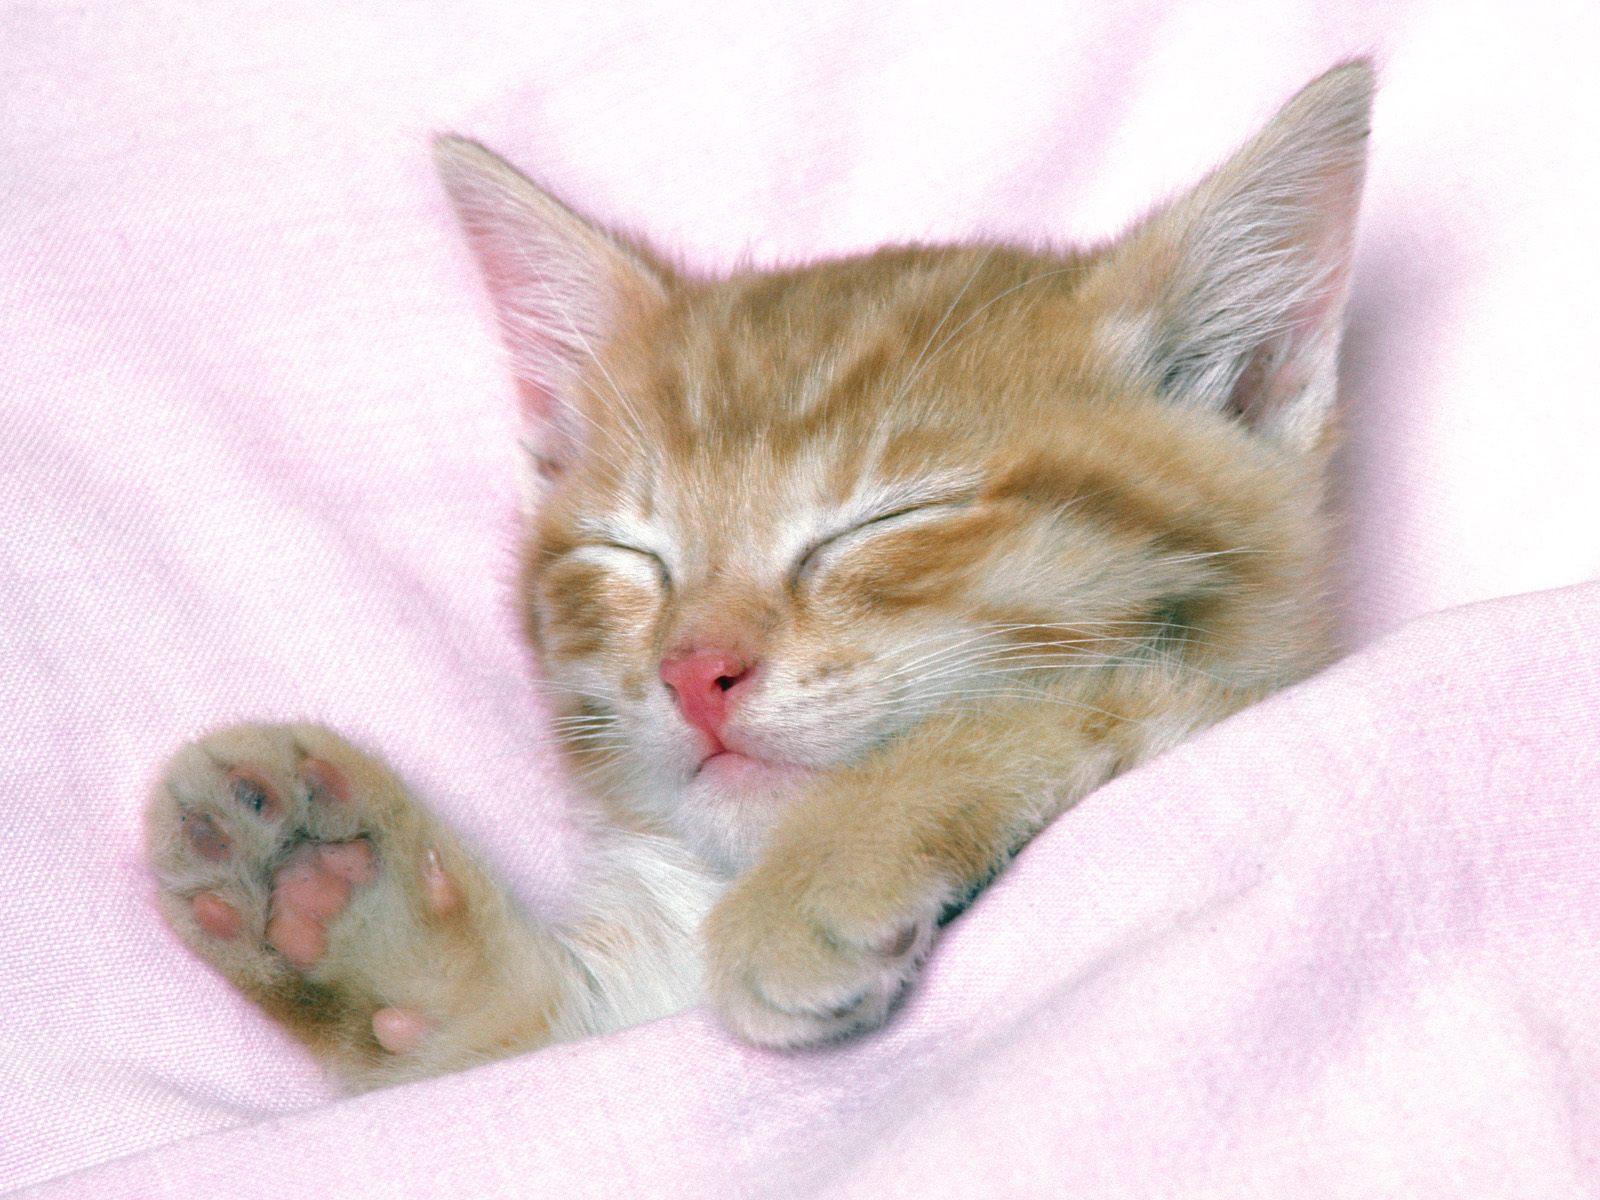 Cute Sleeping Kitten Wallpaper Hd Cats Wallpapers Mobile Wallpapers